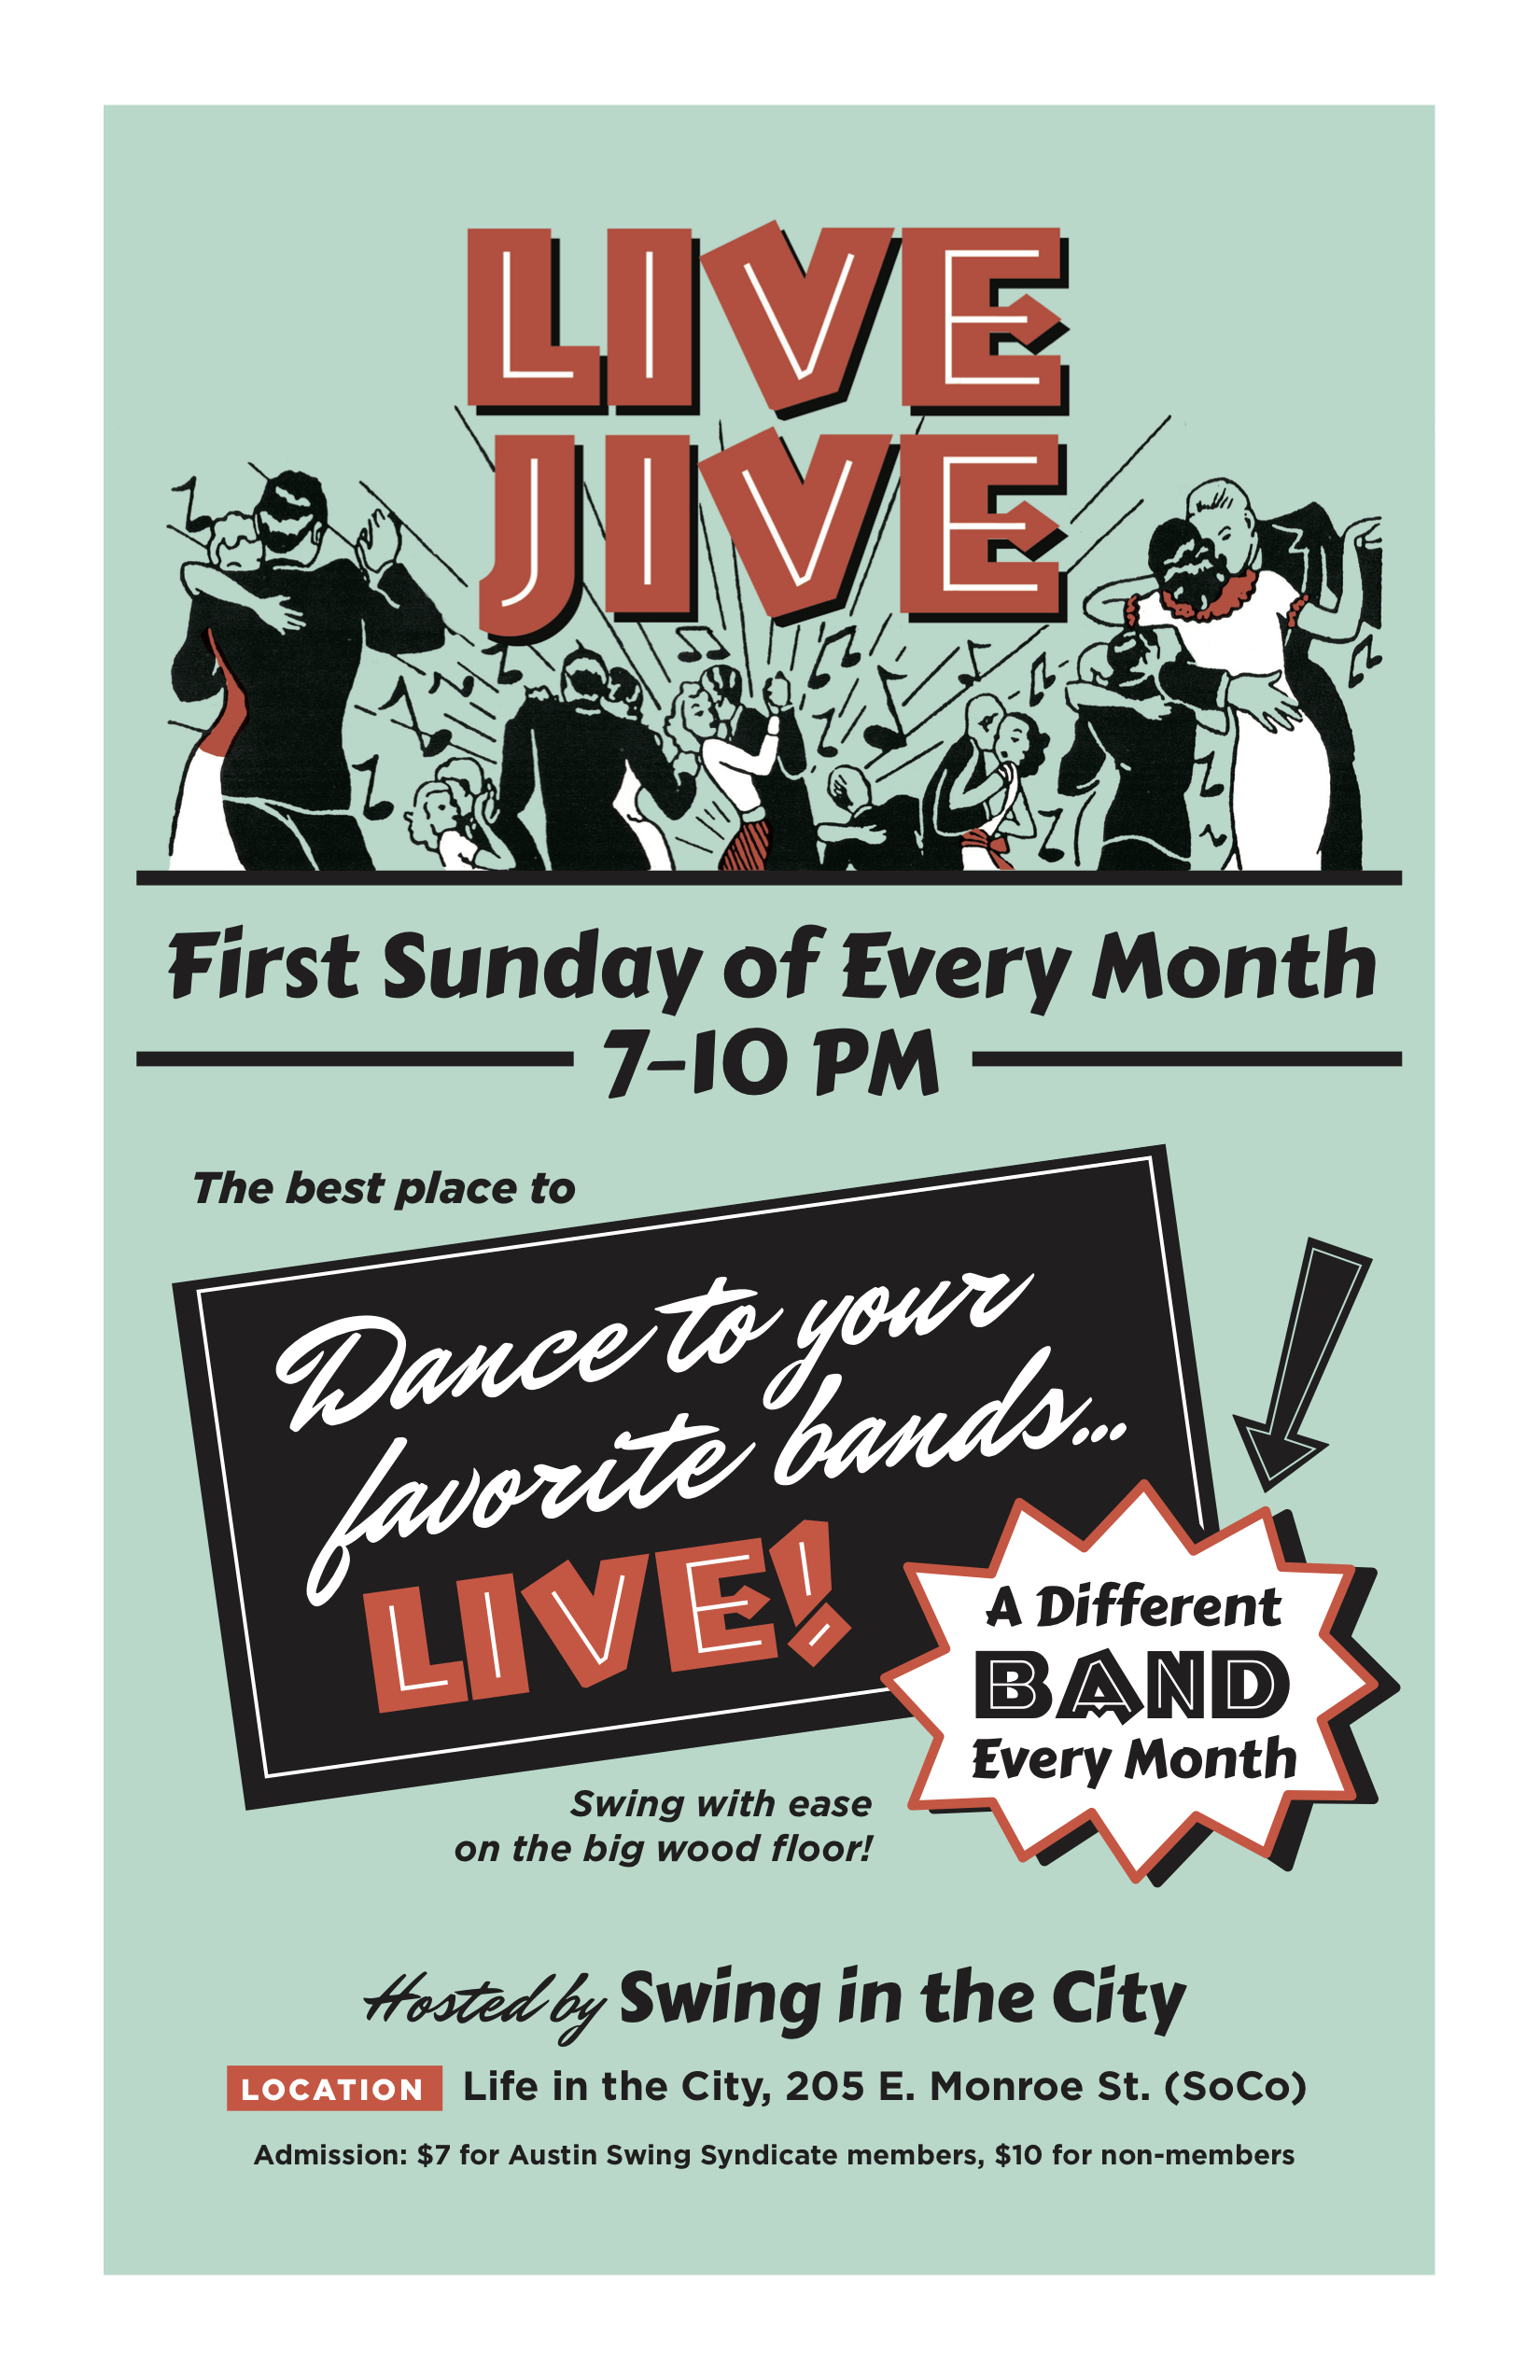 LiveJive Poster-11x17-color.jpg